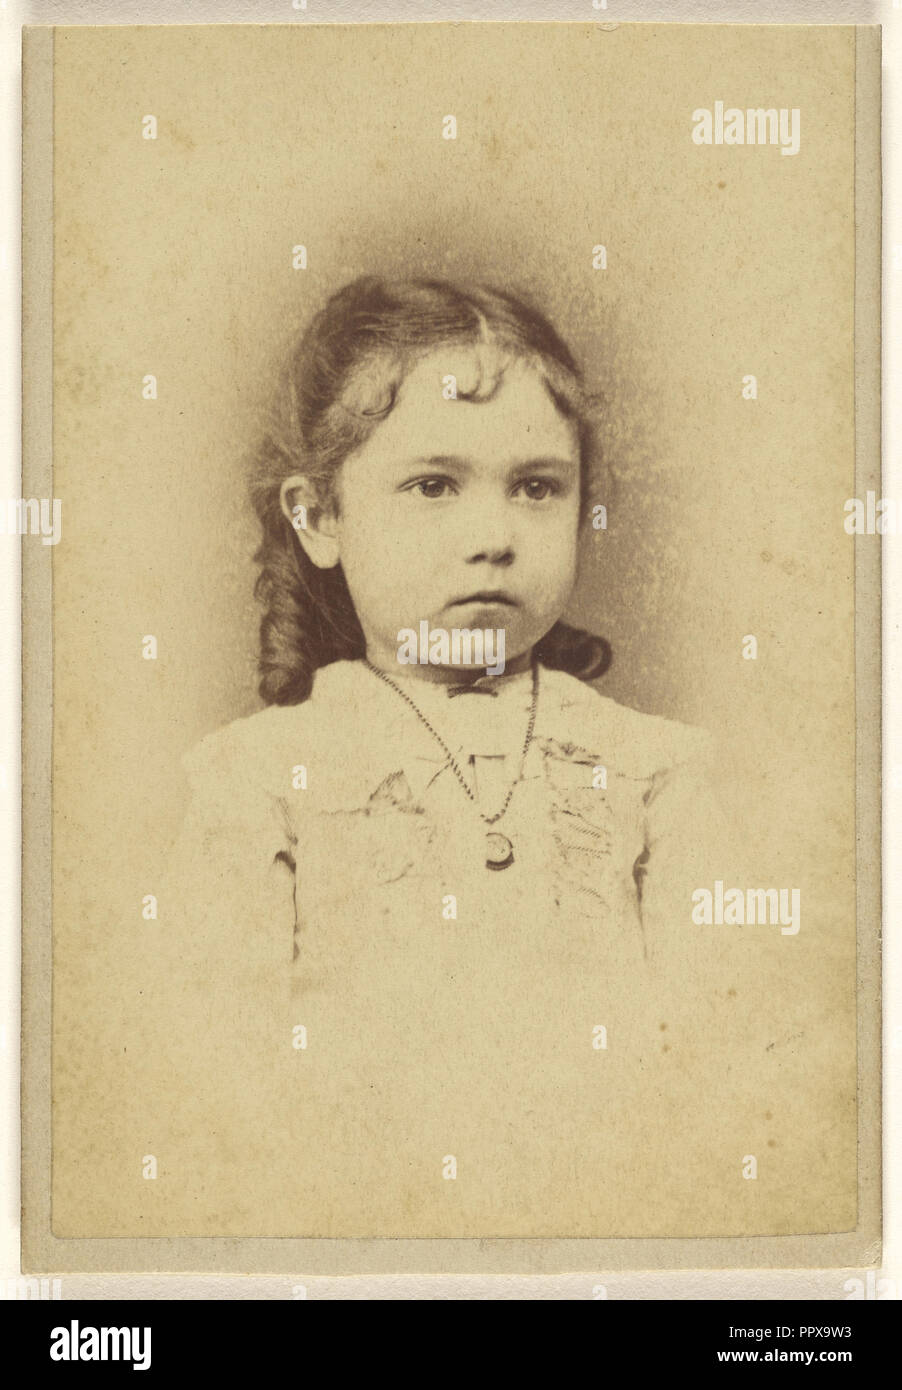 little girl; J.W. Emery, American, active 1860s, 1870s; Albumen silver print - Stock Image